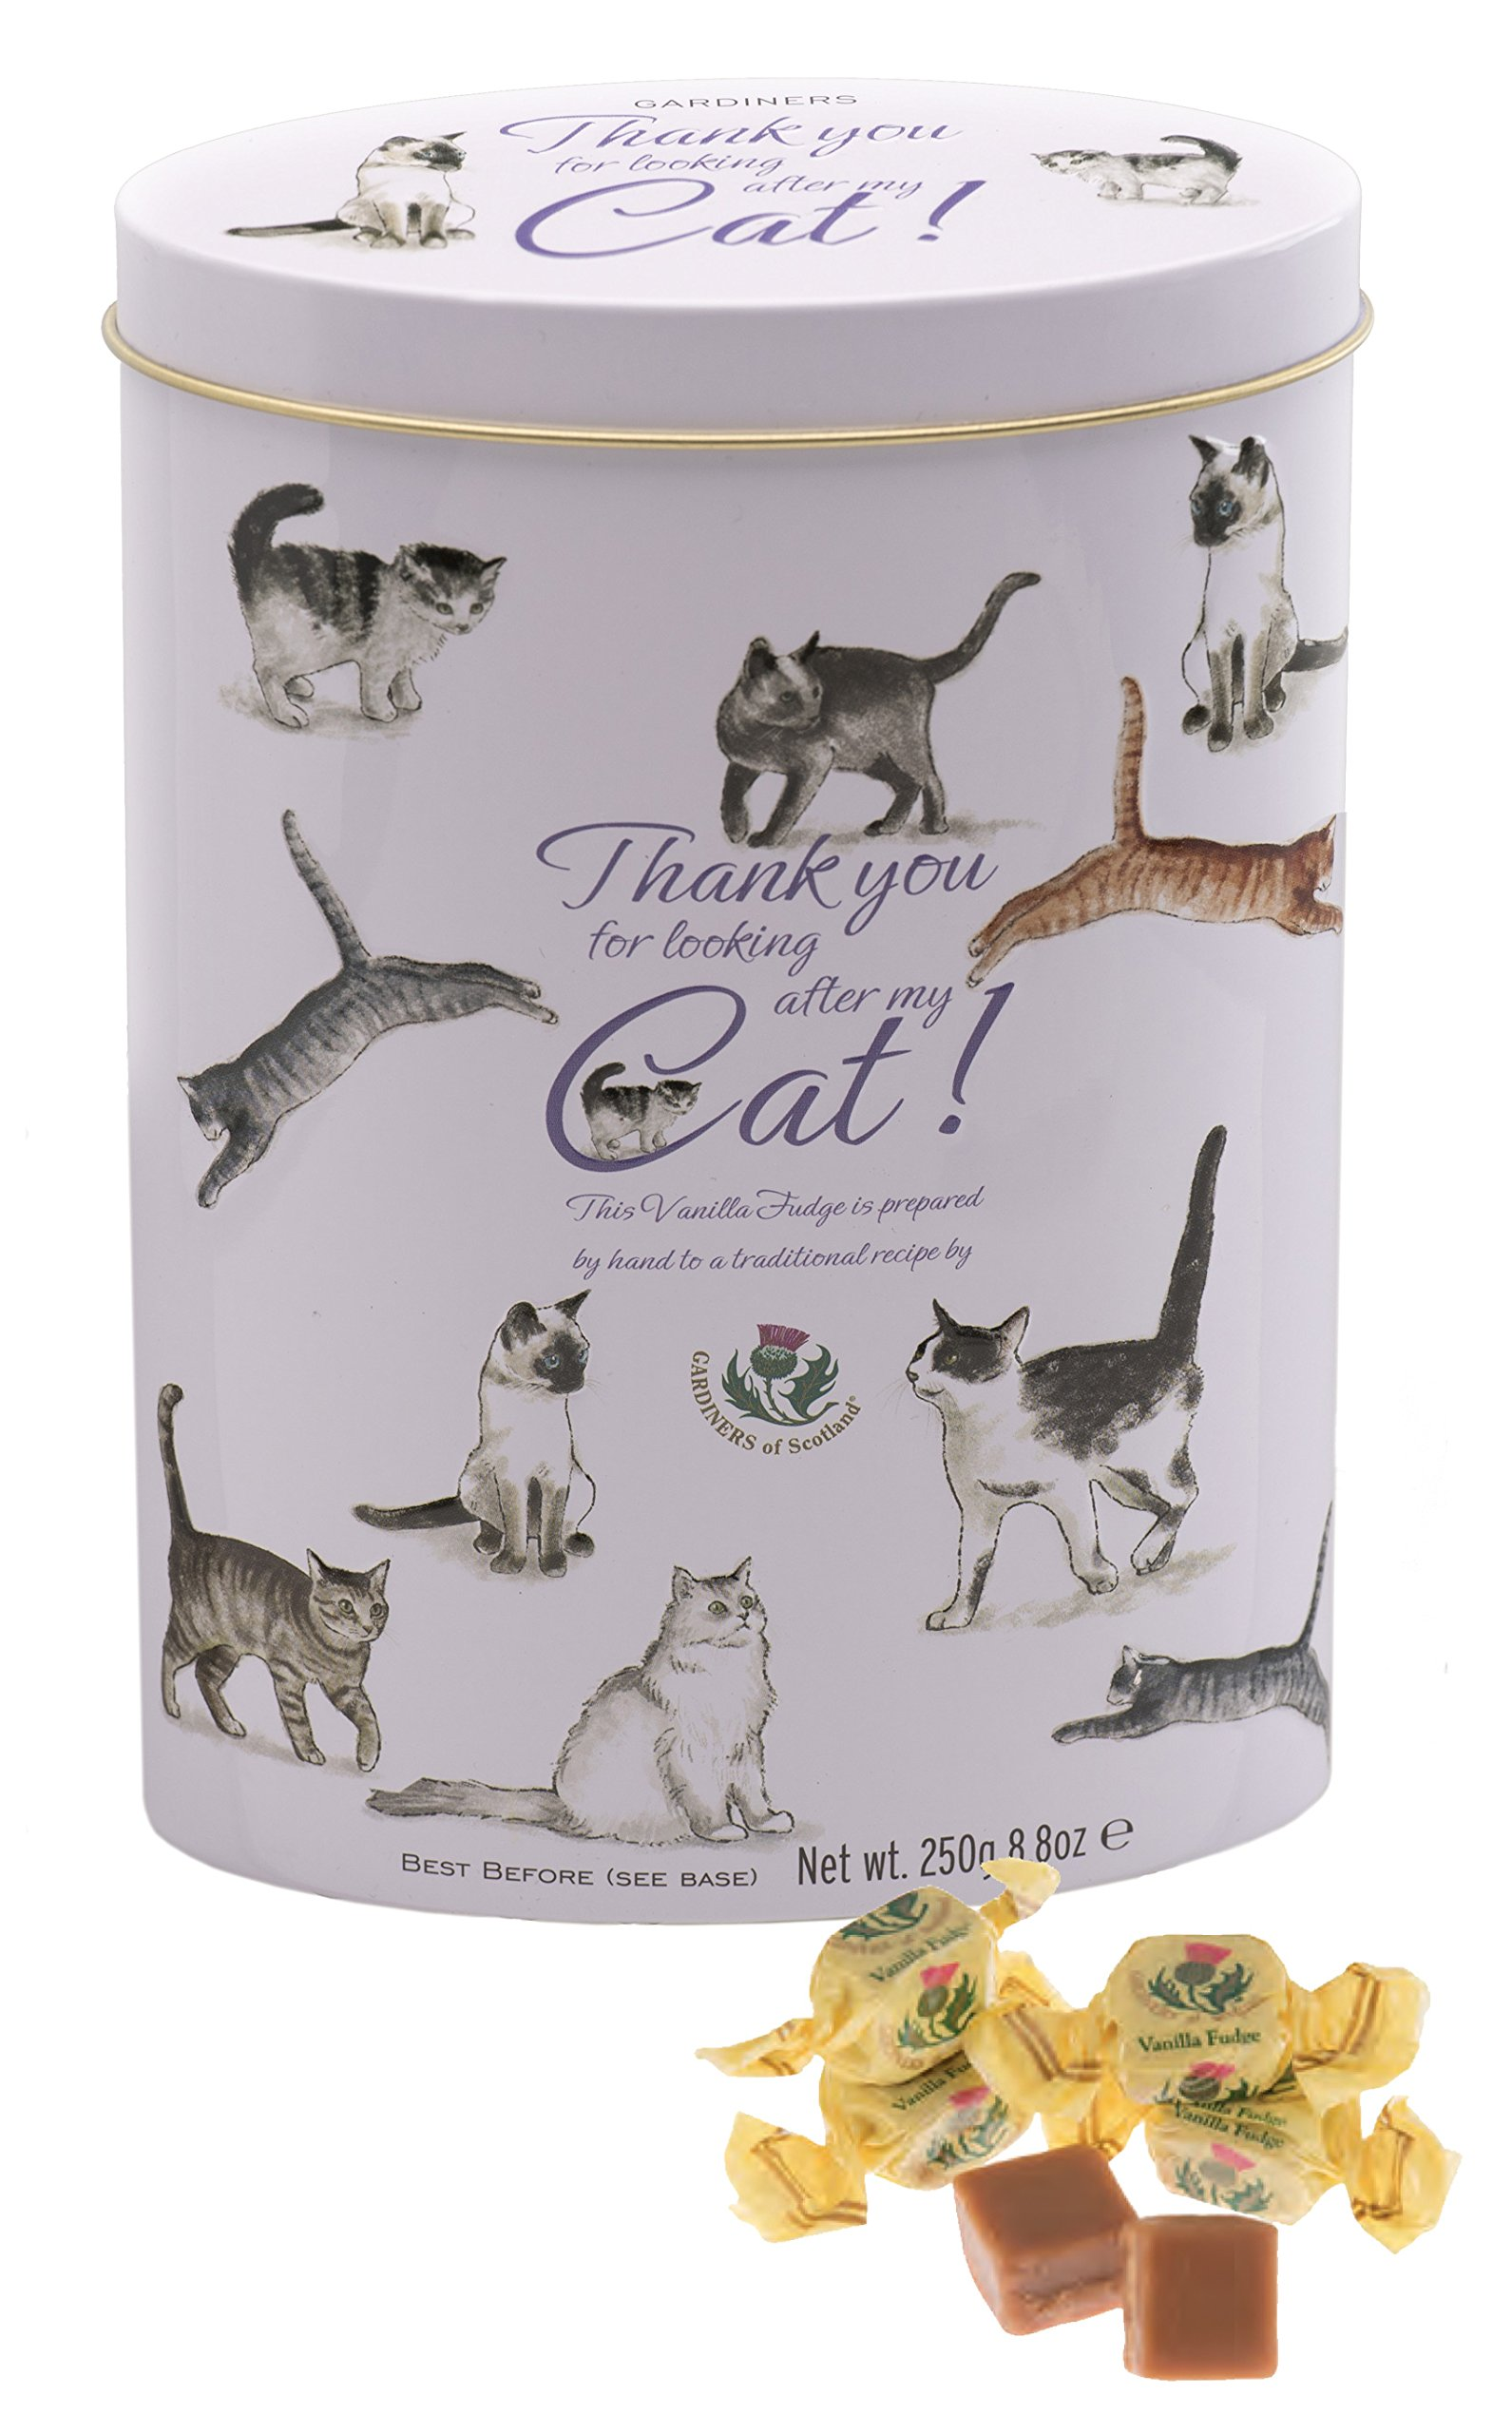 Gardiners of Scotland Vanilla Fudge Thank You Tins 'Cats', 8.8-Ounce